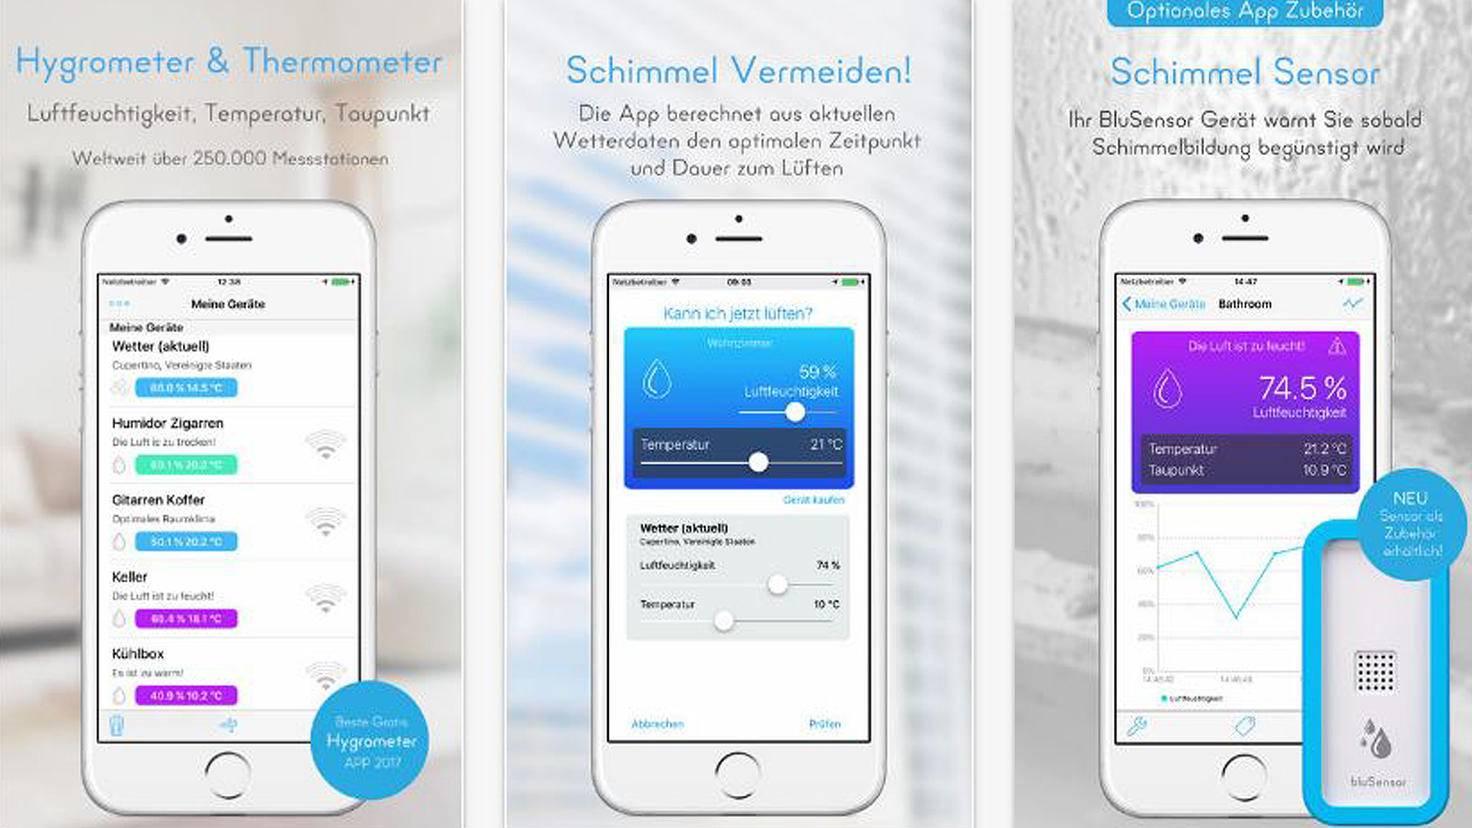 BluSensor AIR - Hygrometer-iTunes-Almendo Technologies GmbH